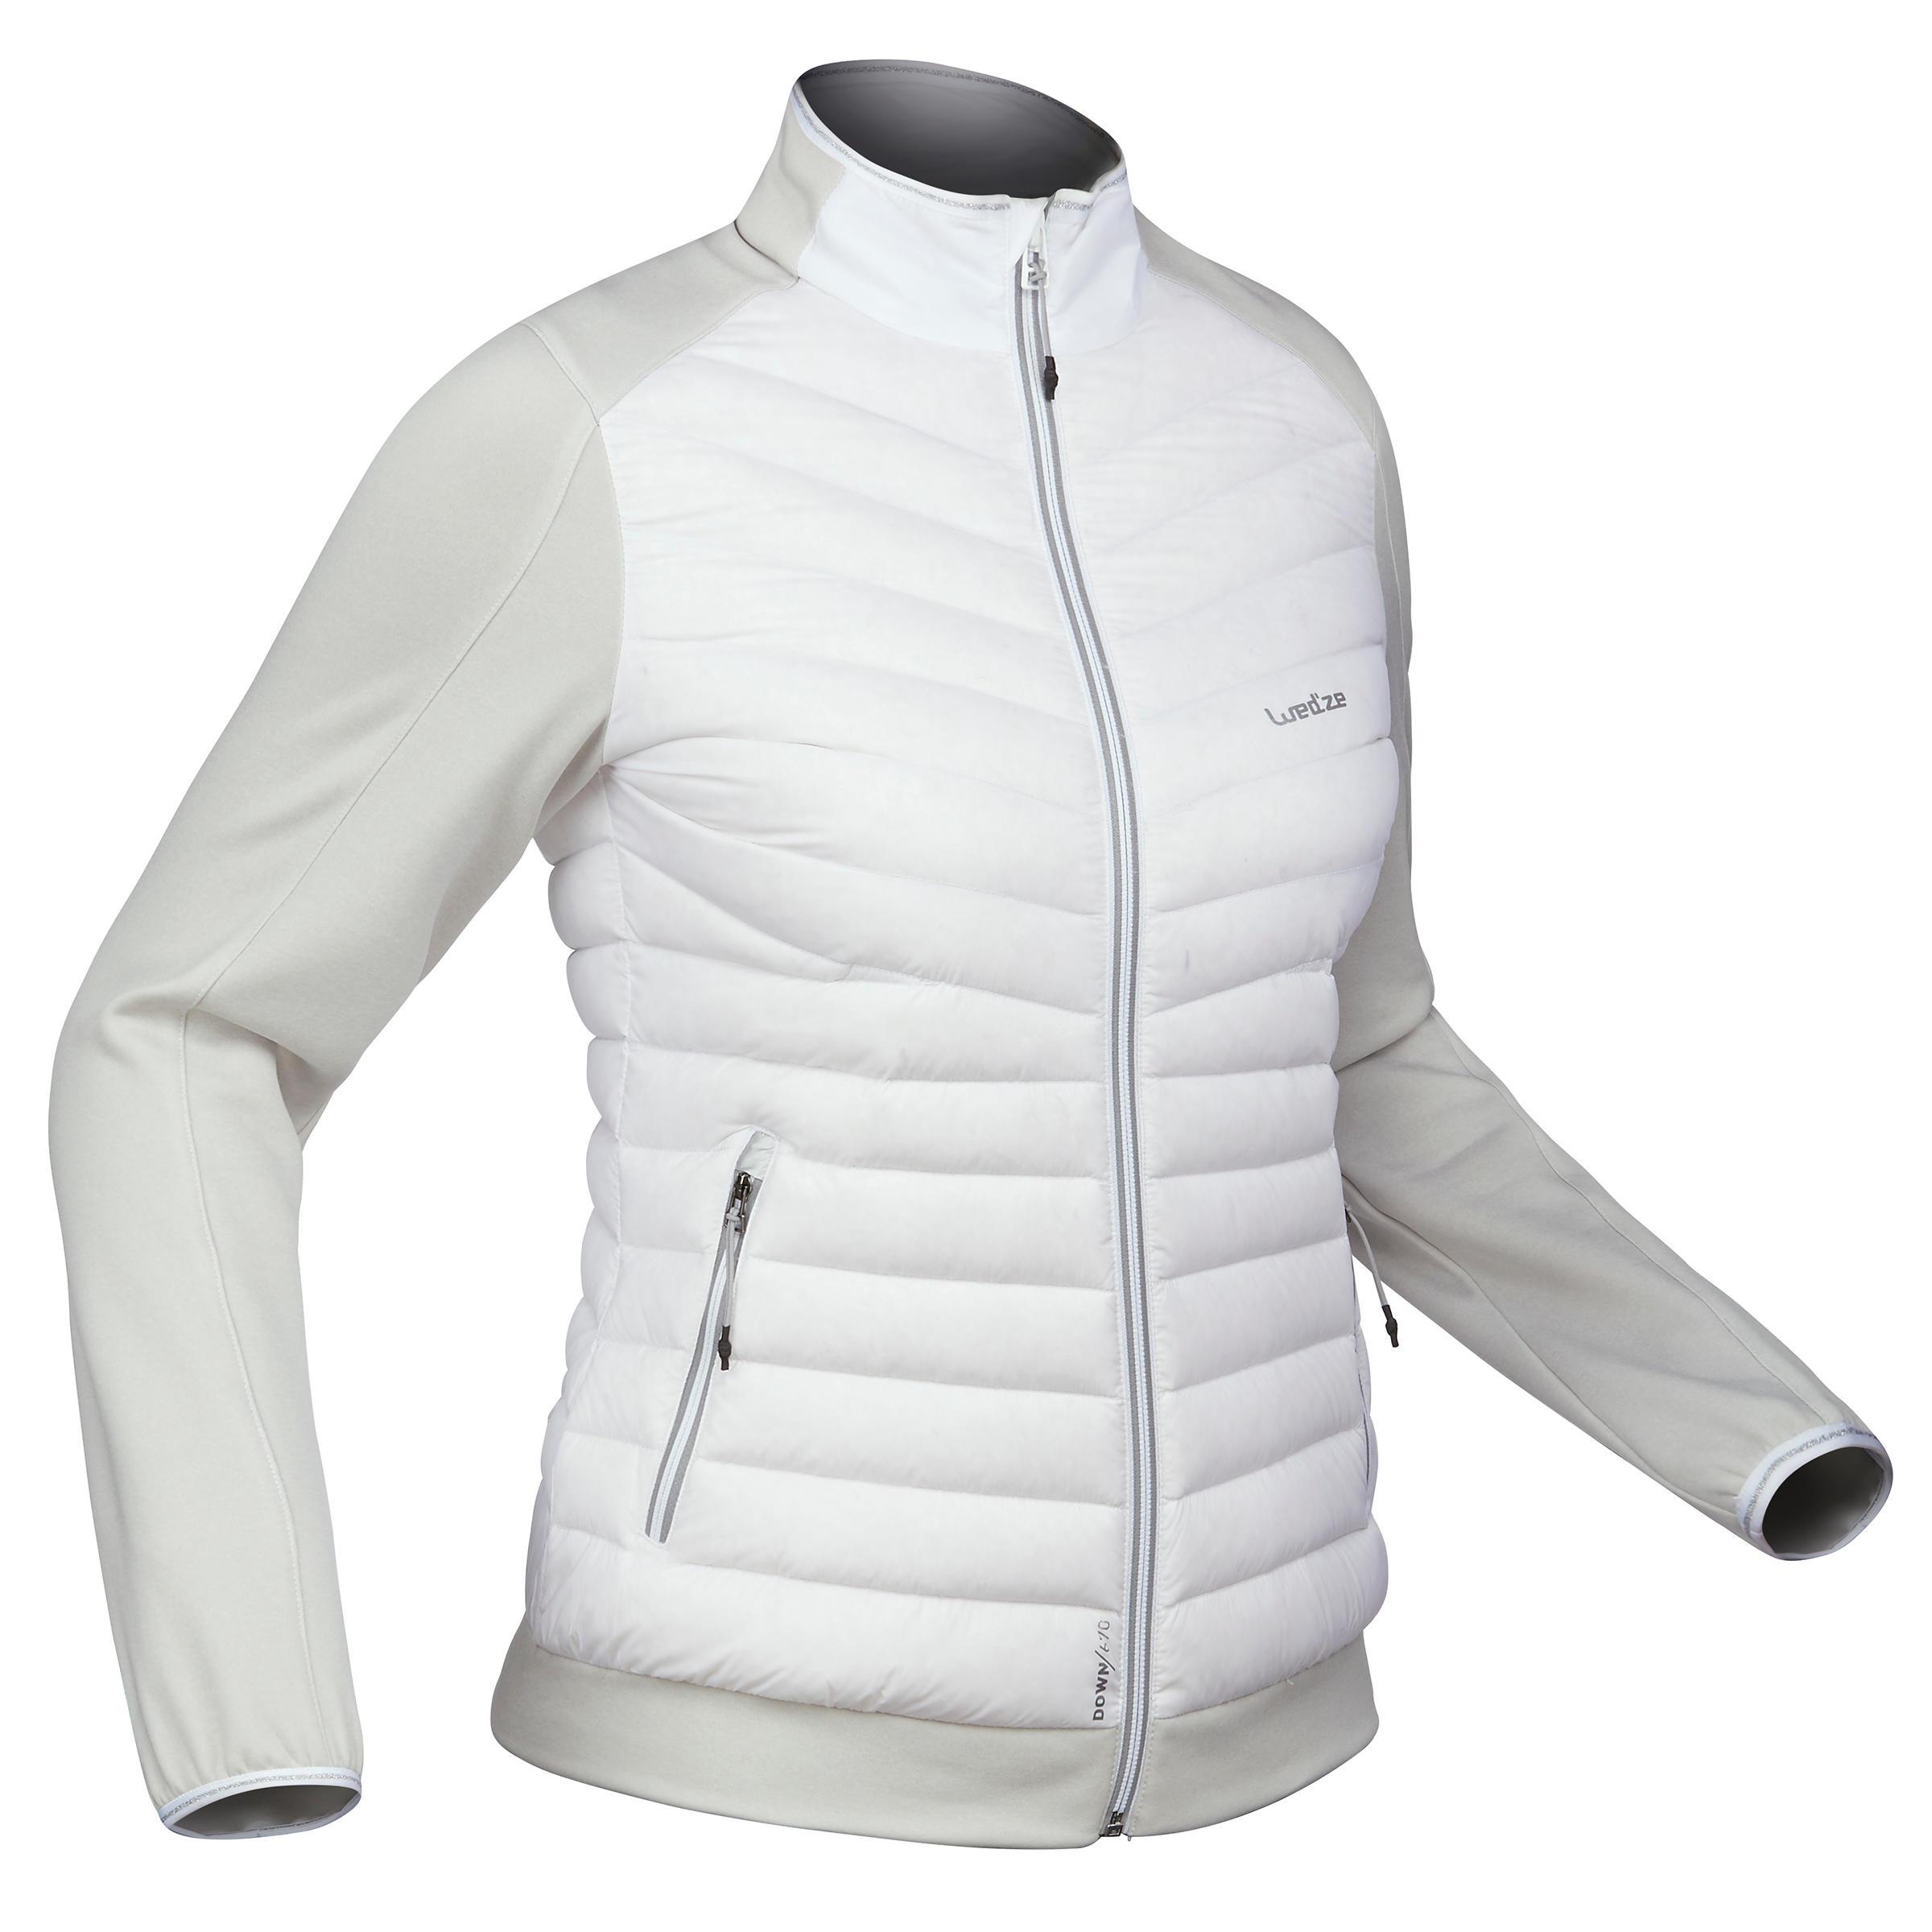 Jachetă schi 900 Alb Damă